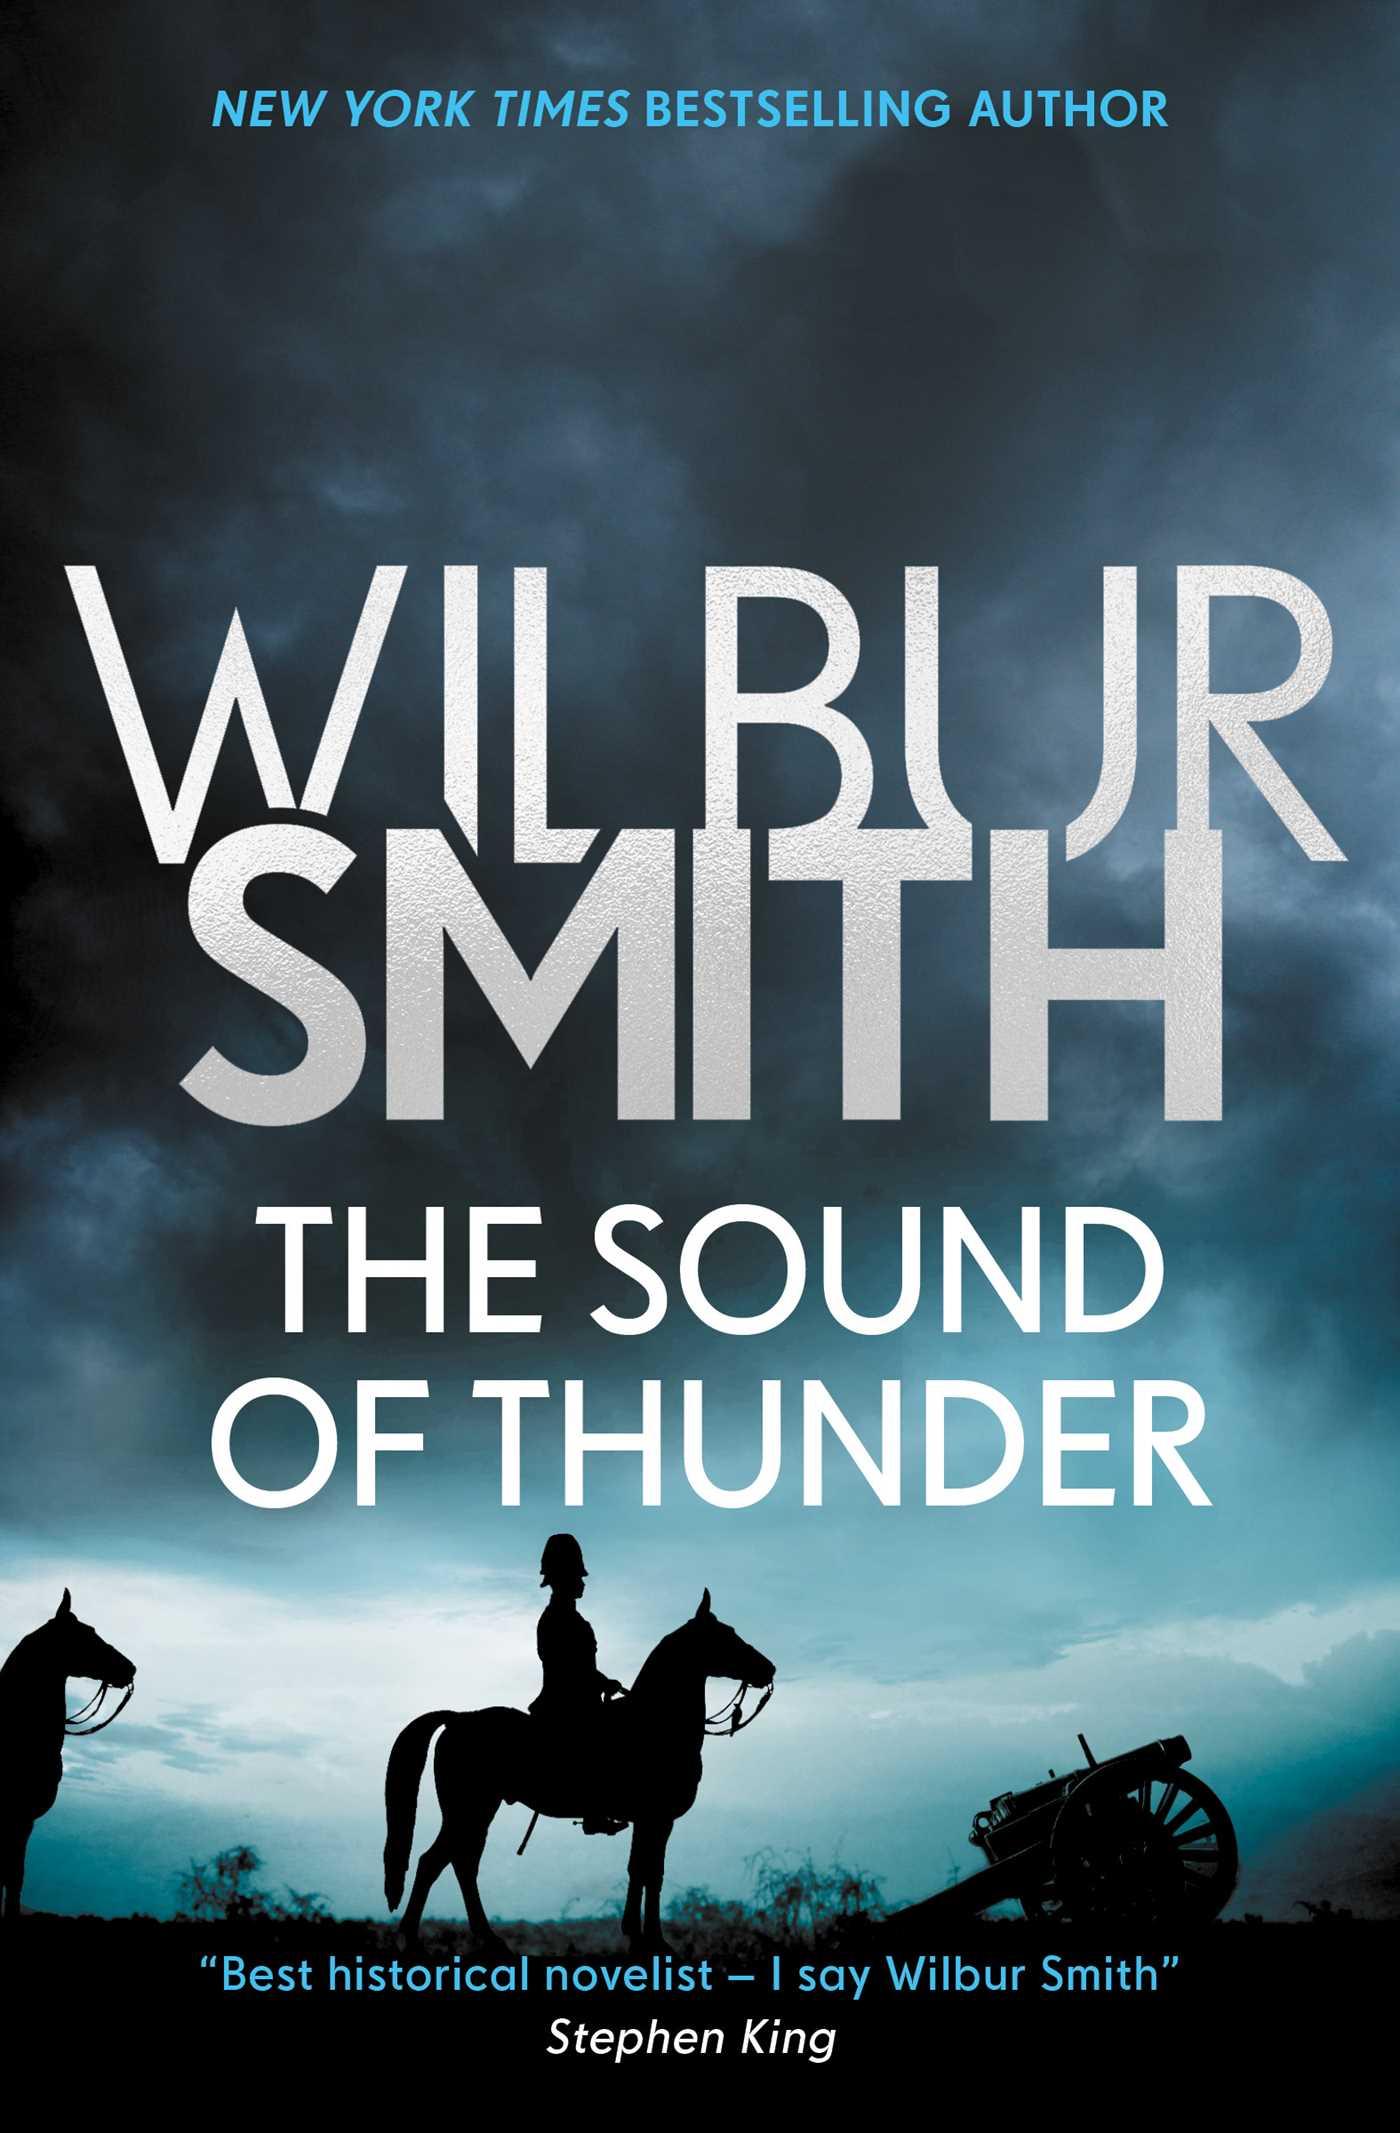 The sound of thunder 9781499860085 hr